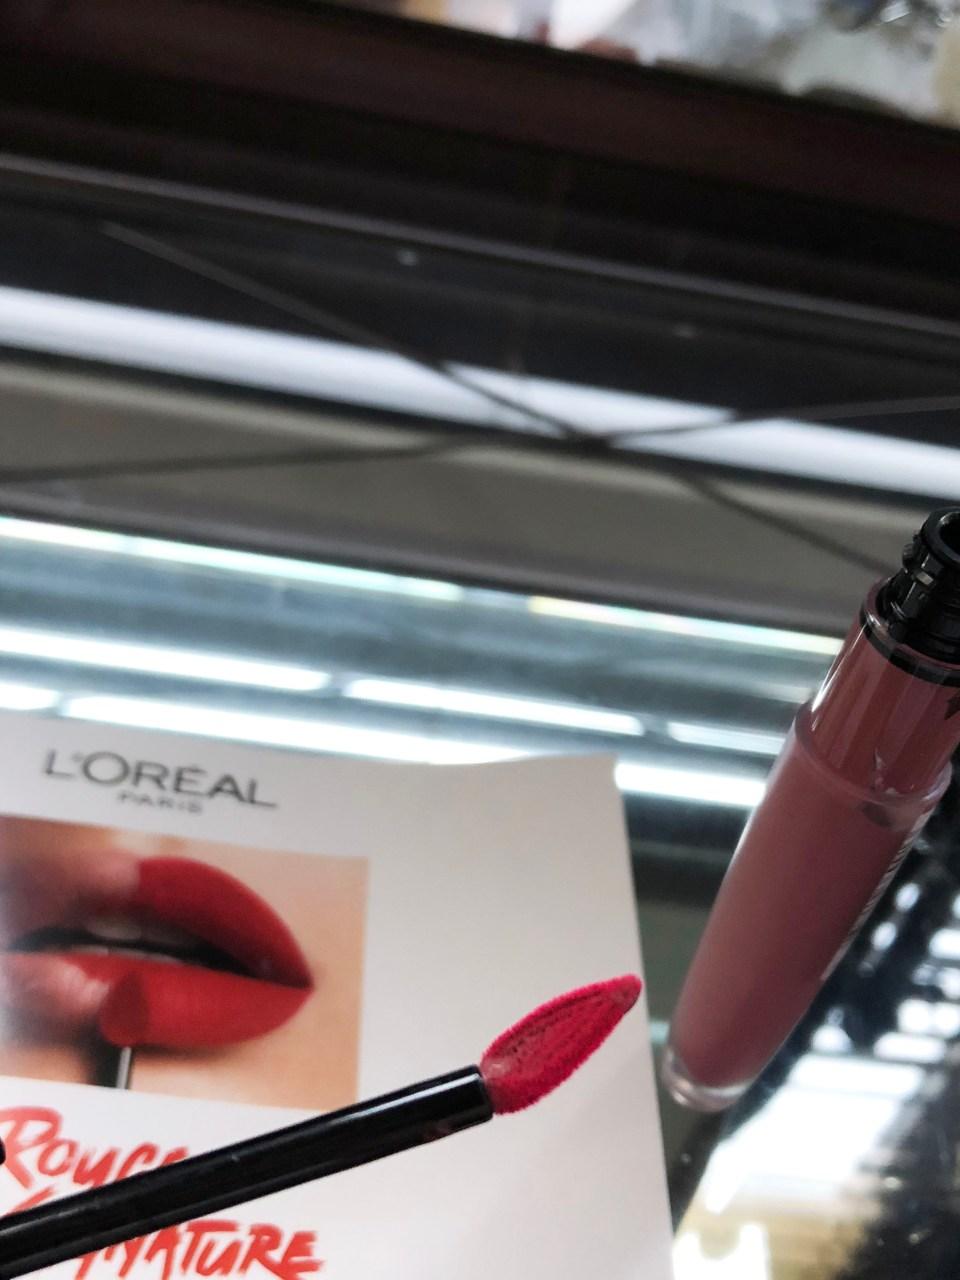 L'Oreal Rouge Signature Matte Colored Ink - I Rule